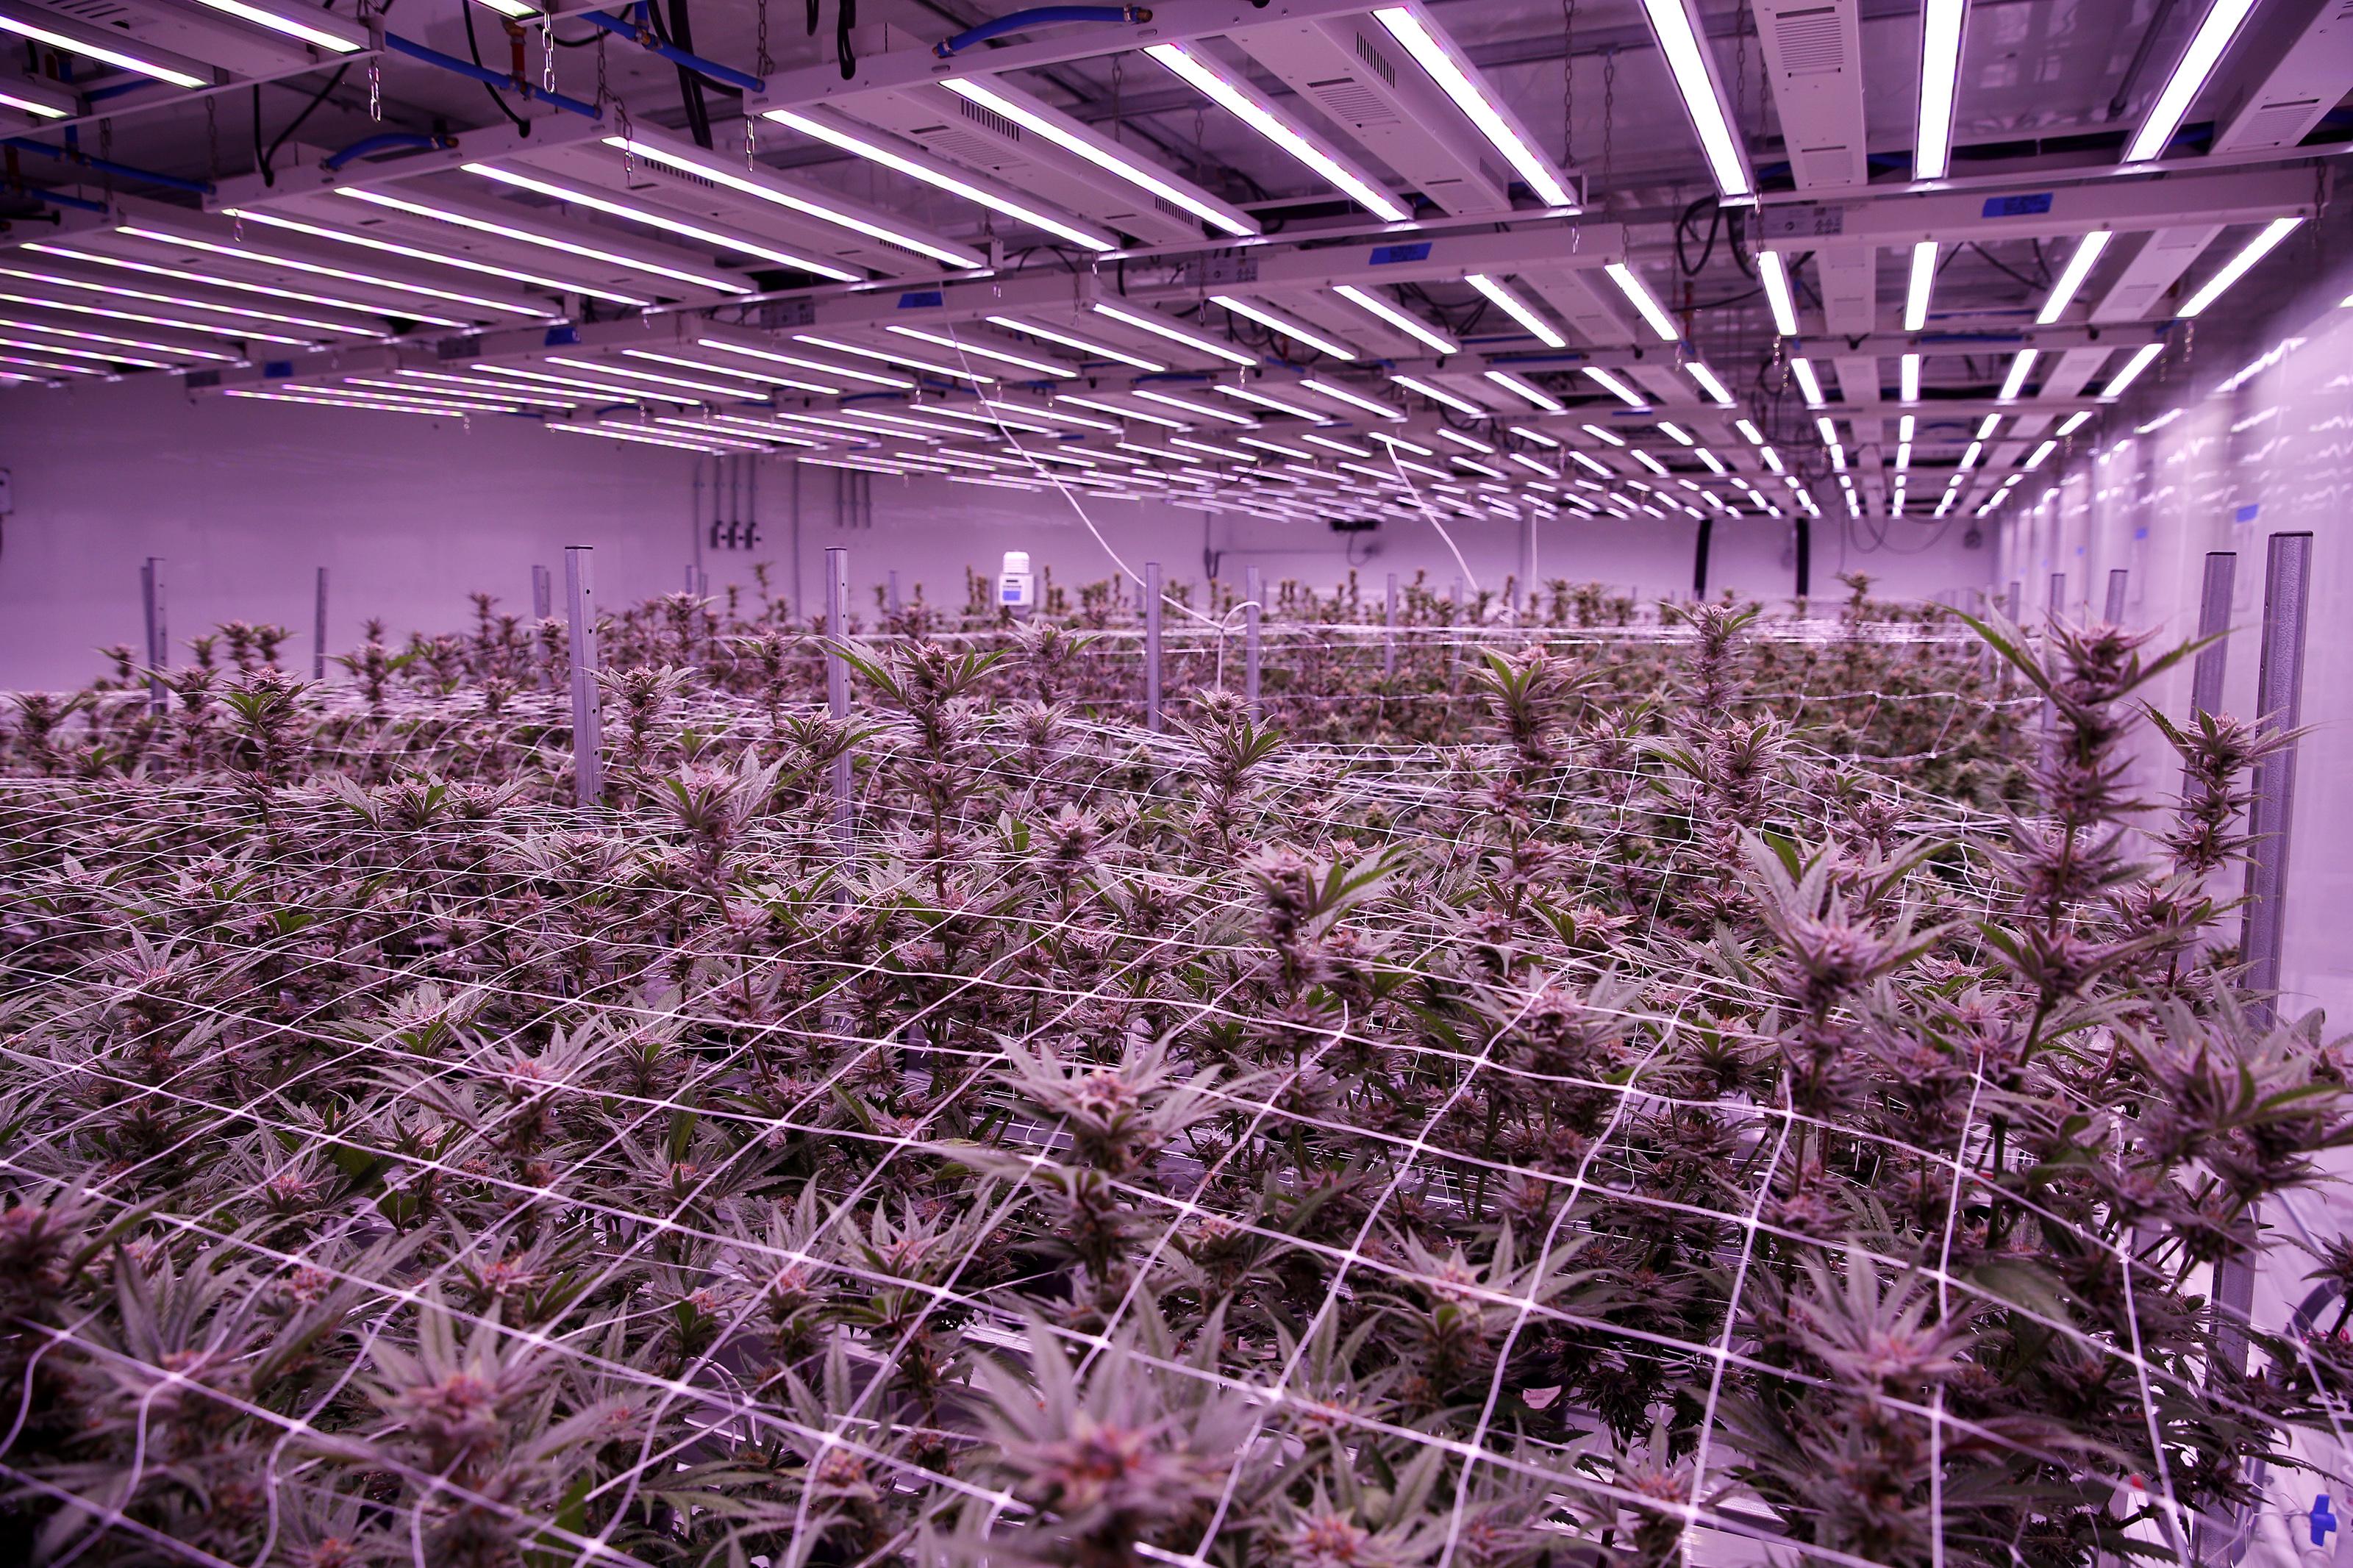 Is Massachusetts growing enough pot? - The Boston Globe